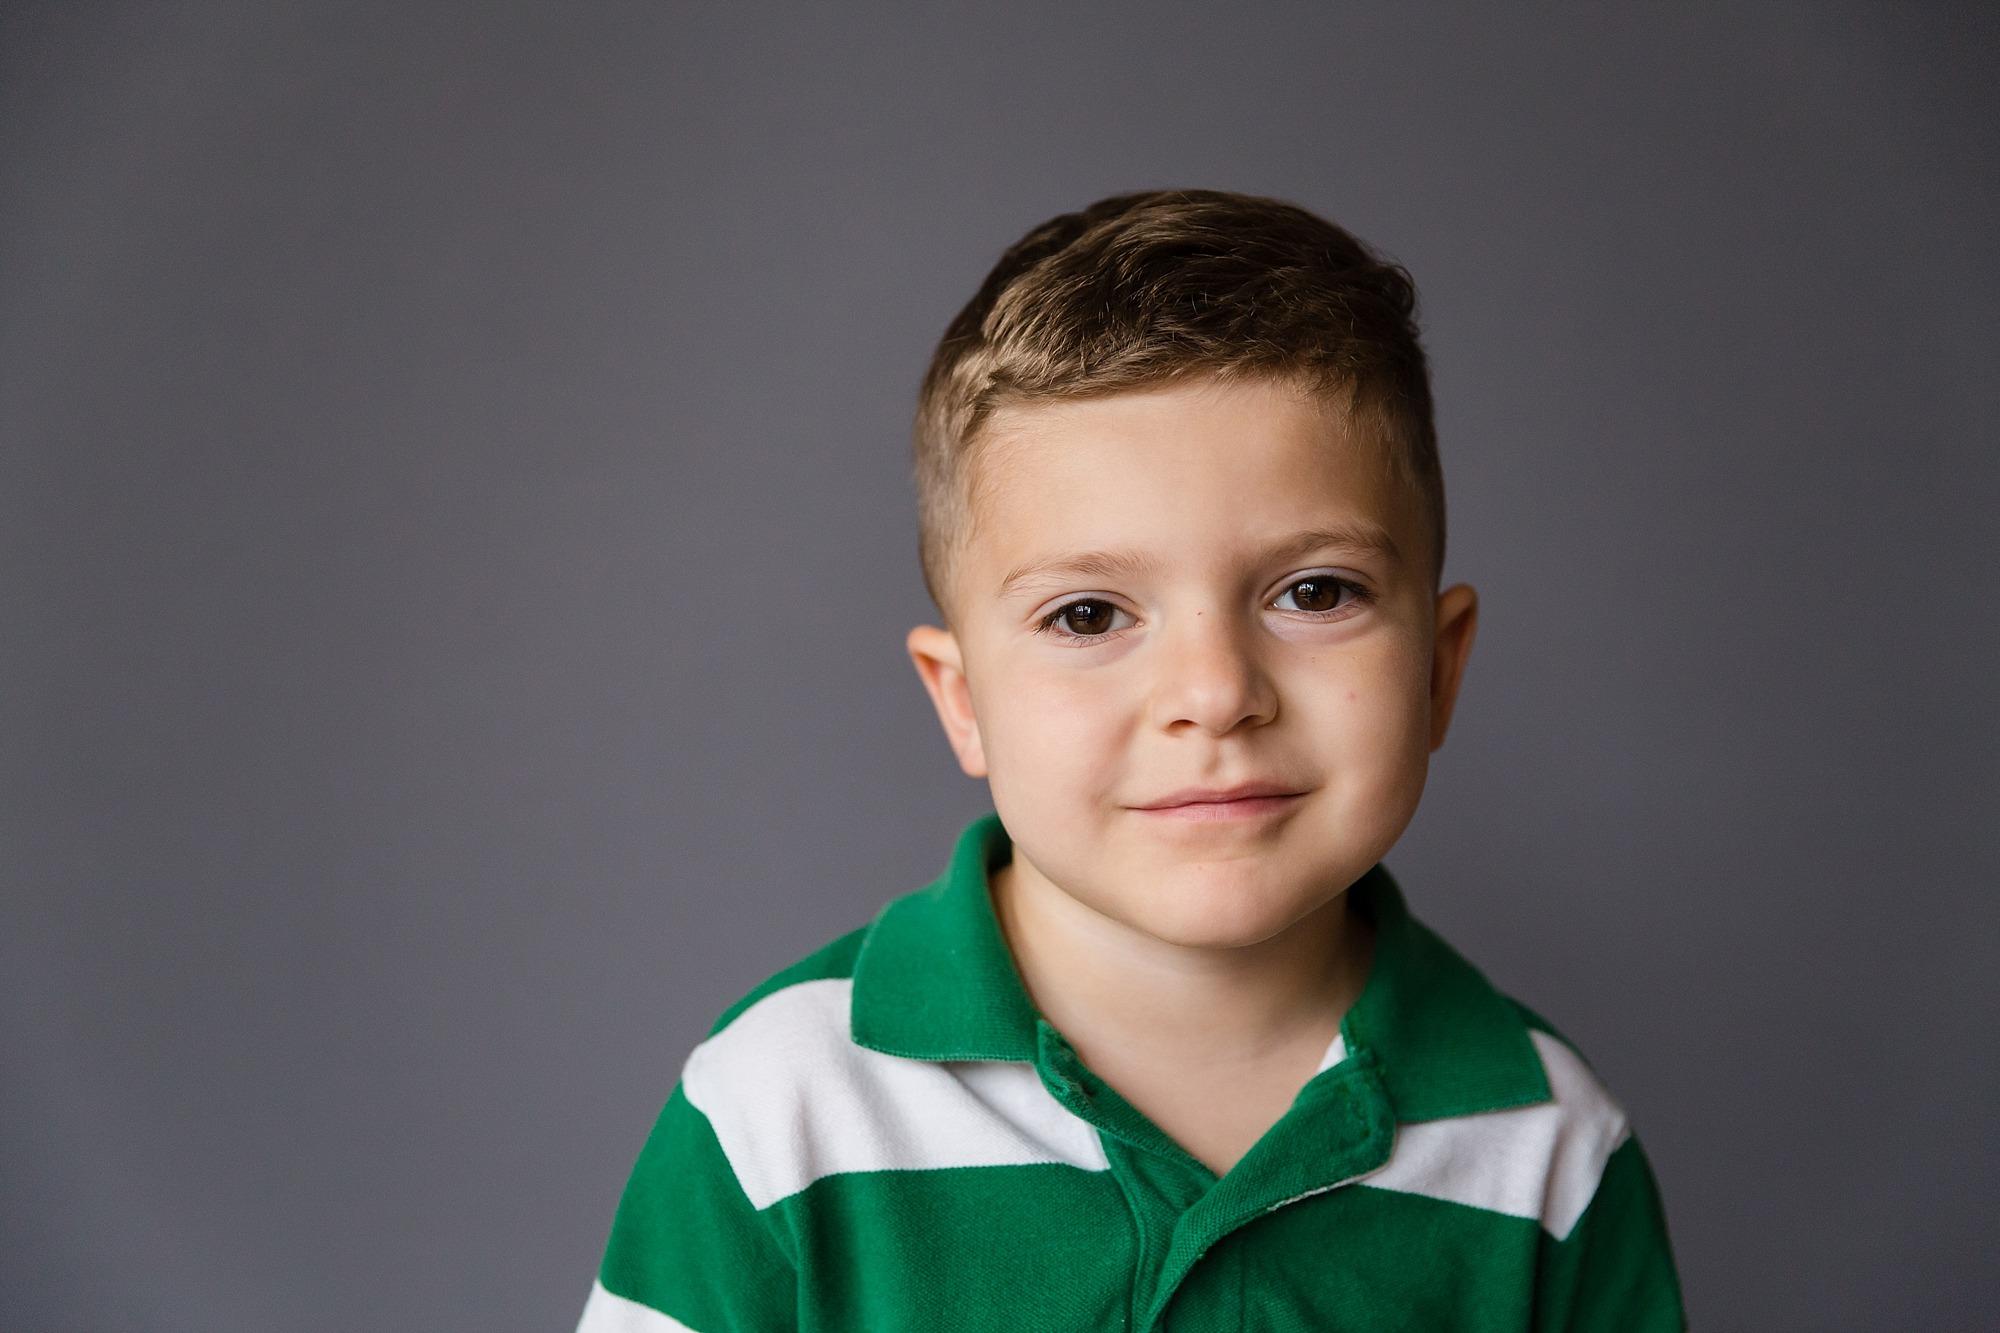 Modern_Childrens_Portraits_Hunnicutt_Photography_Collages_0008